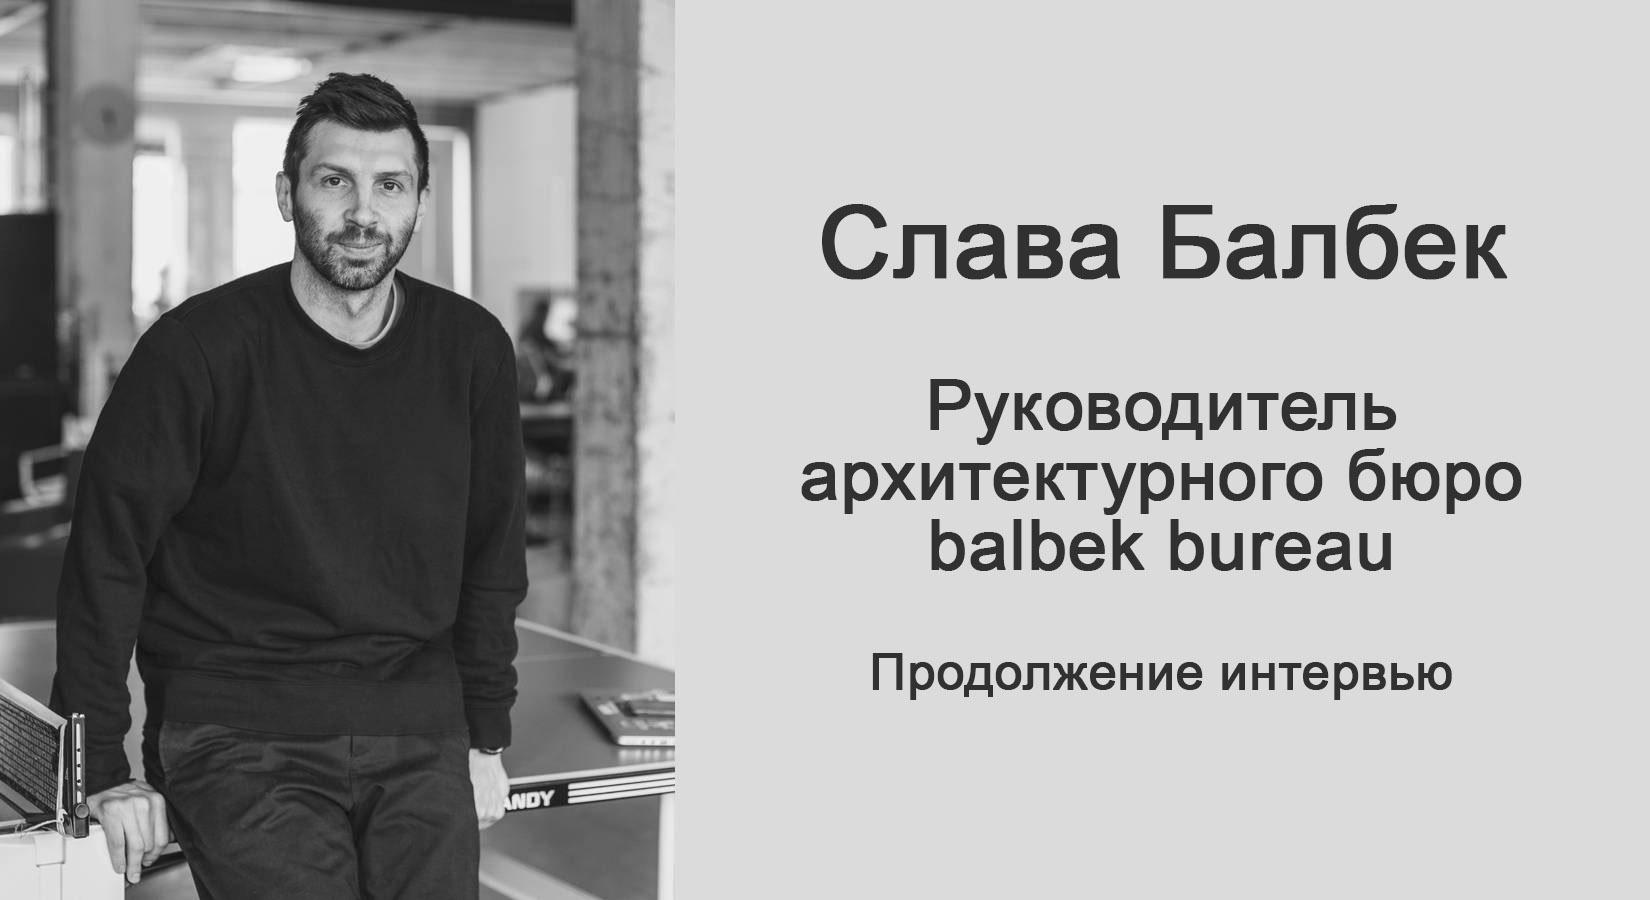 Інтерв'ю Слави Балбека (balbek bureau) бренду DAVIS CASA. Частина 2